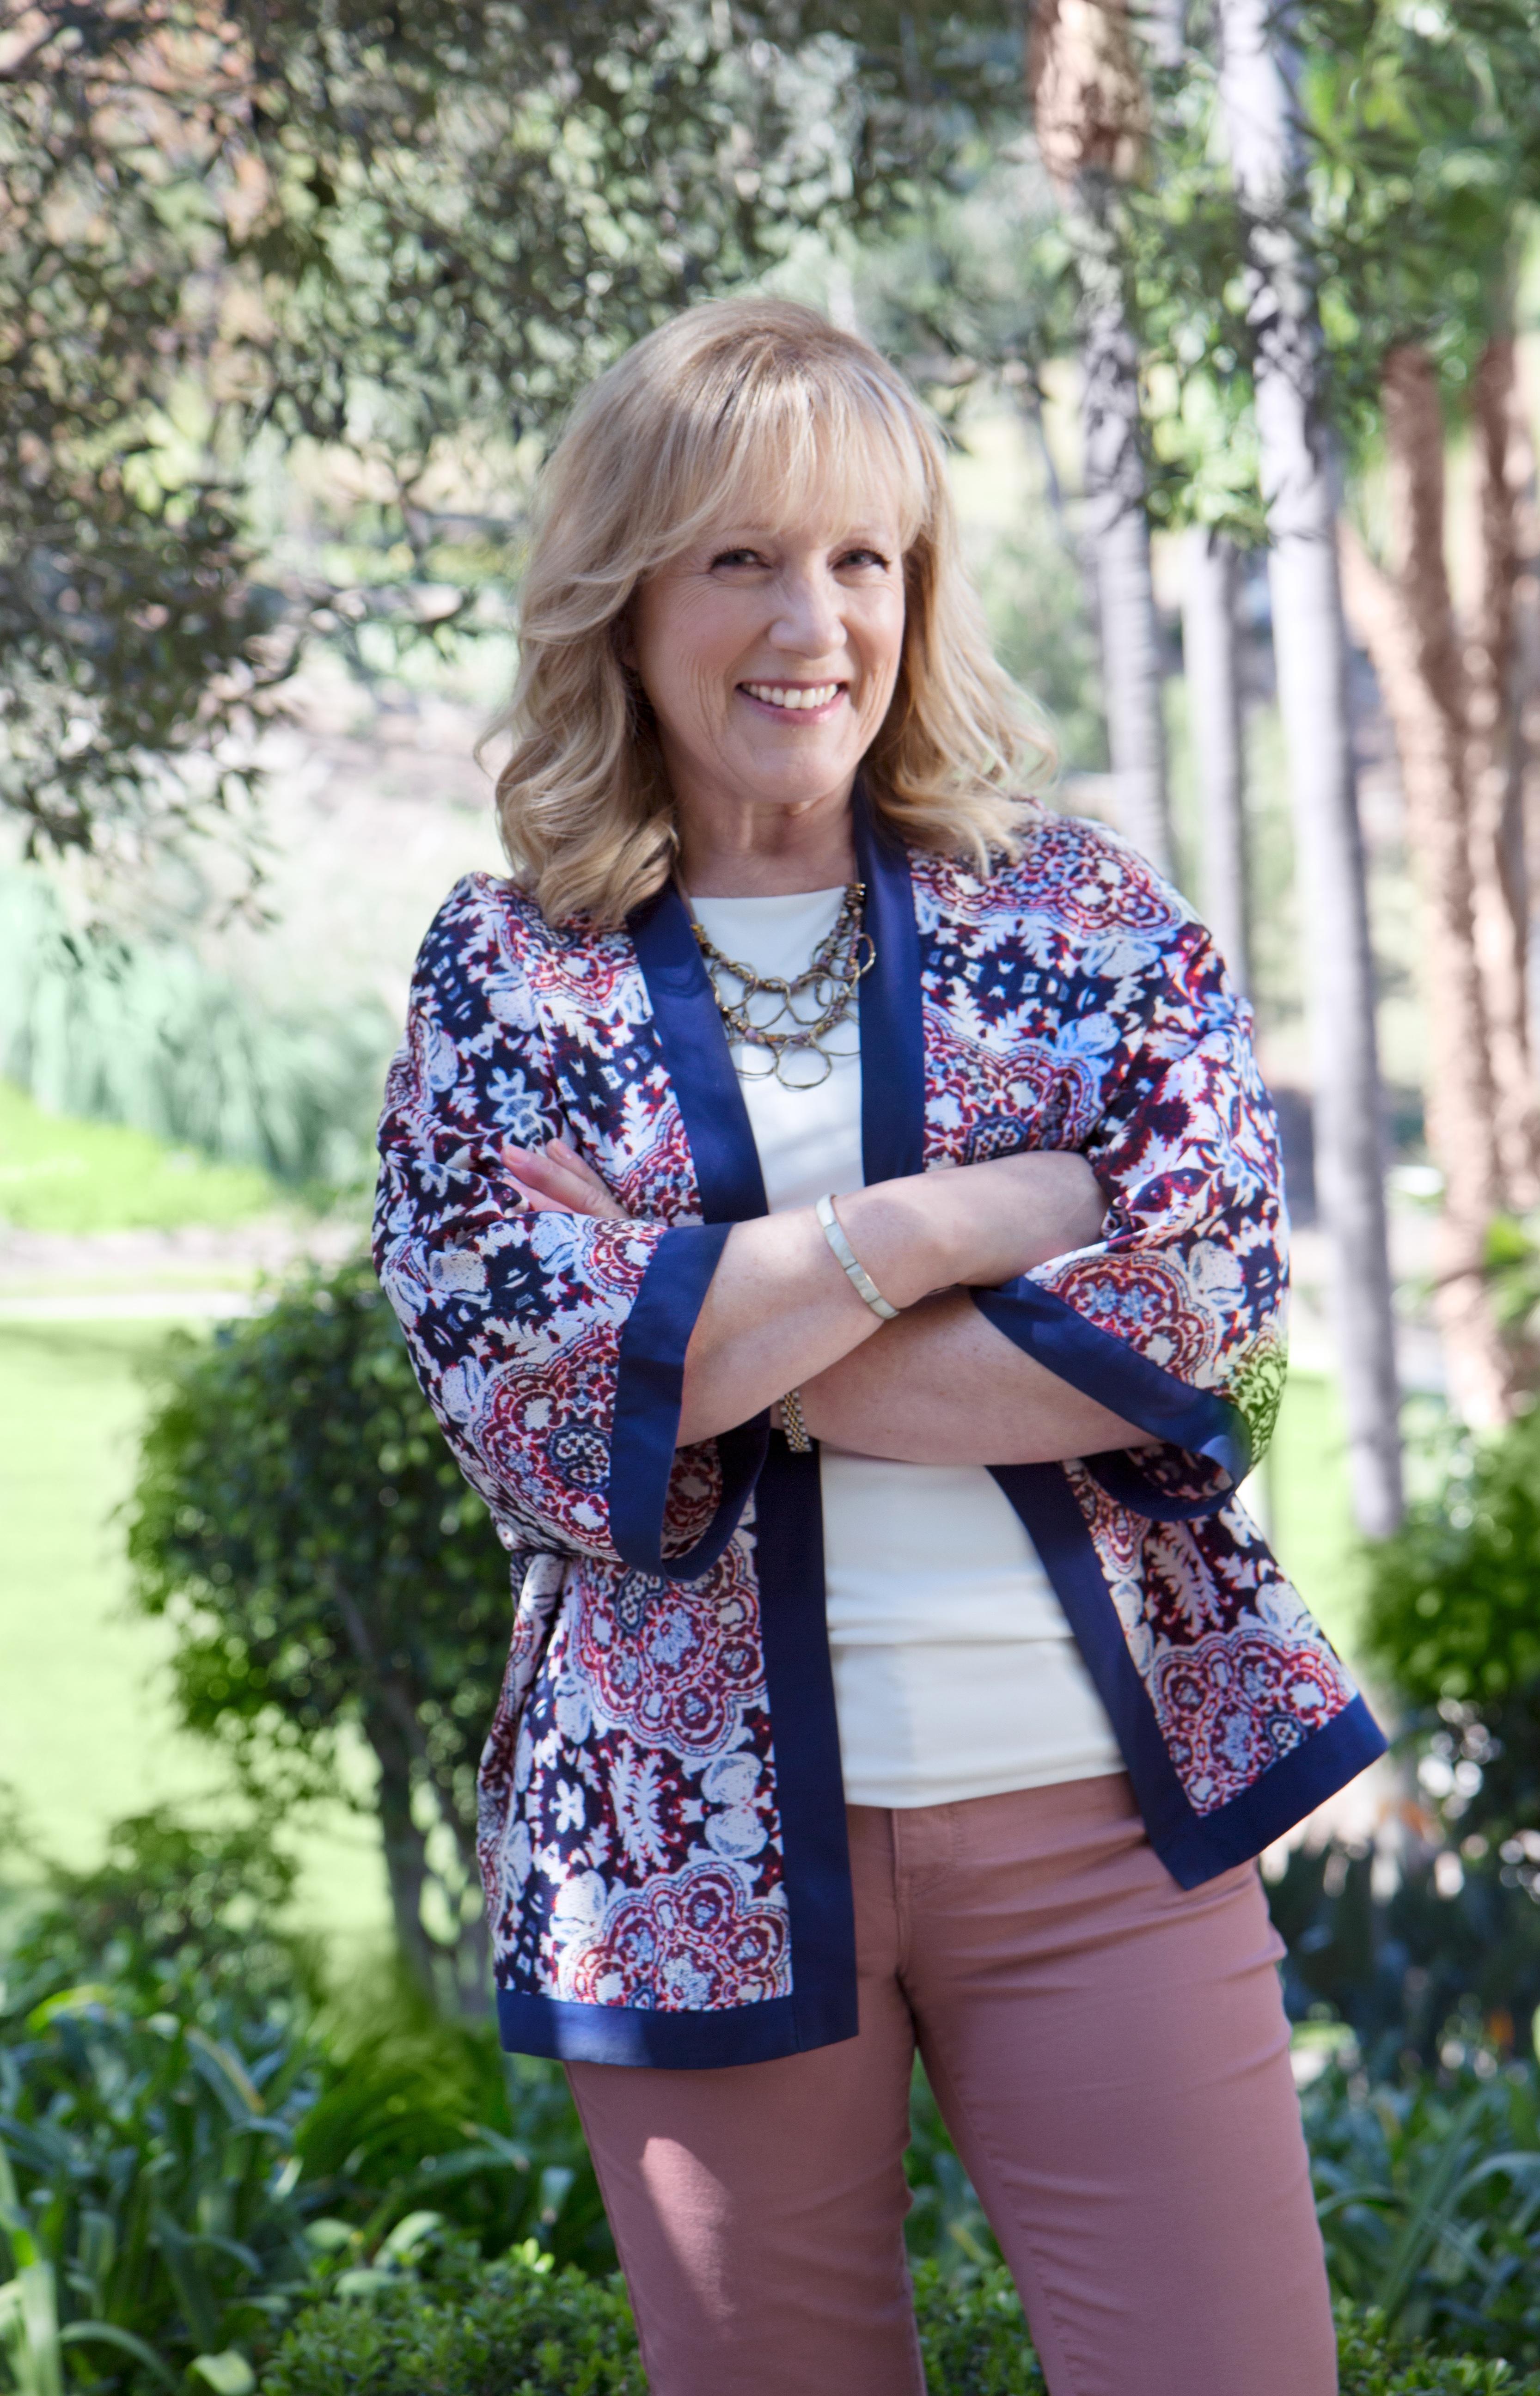 Author of Choose Joy, Kay Warren & husband to pastor Rick Warrn